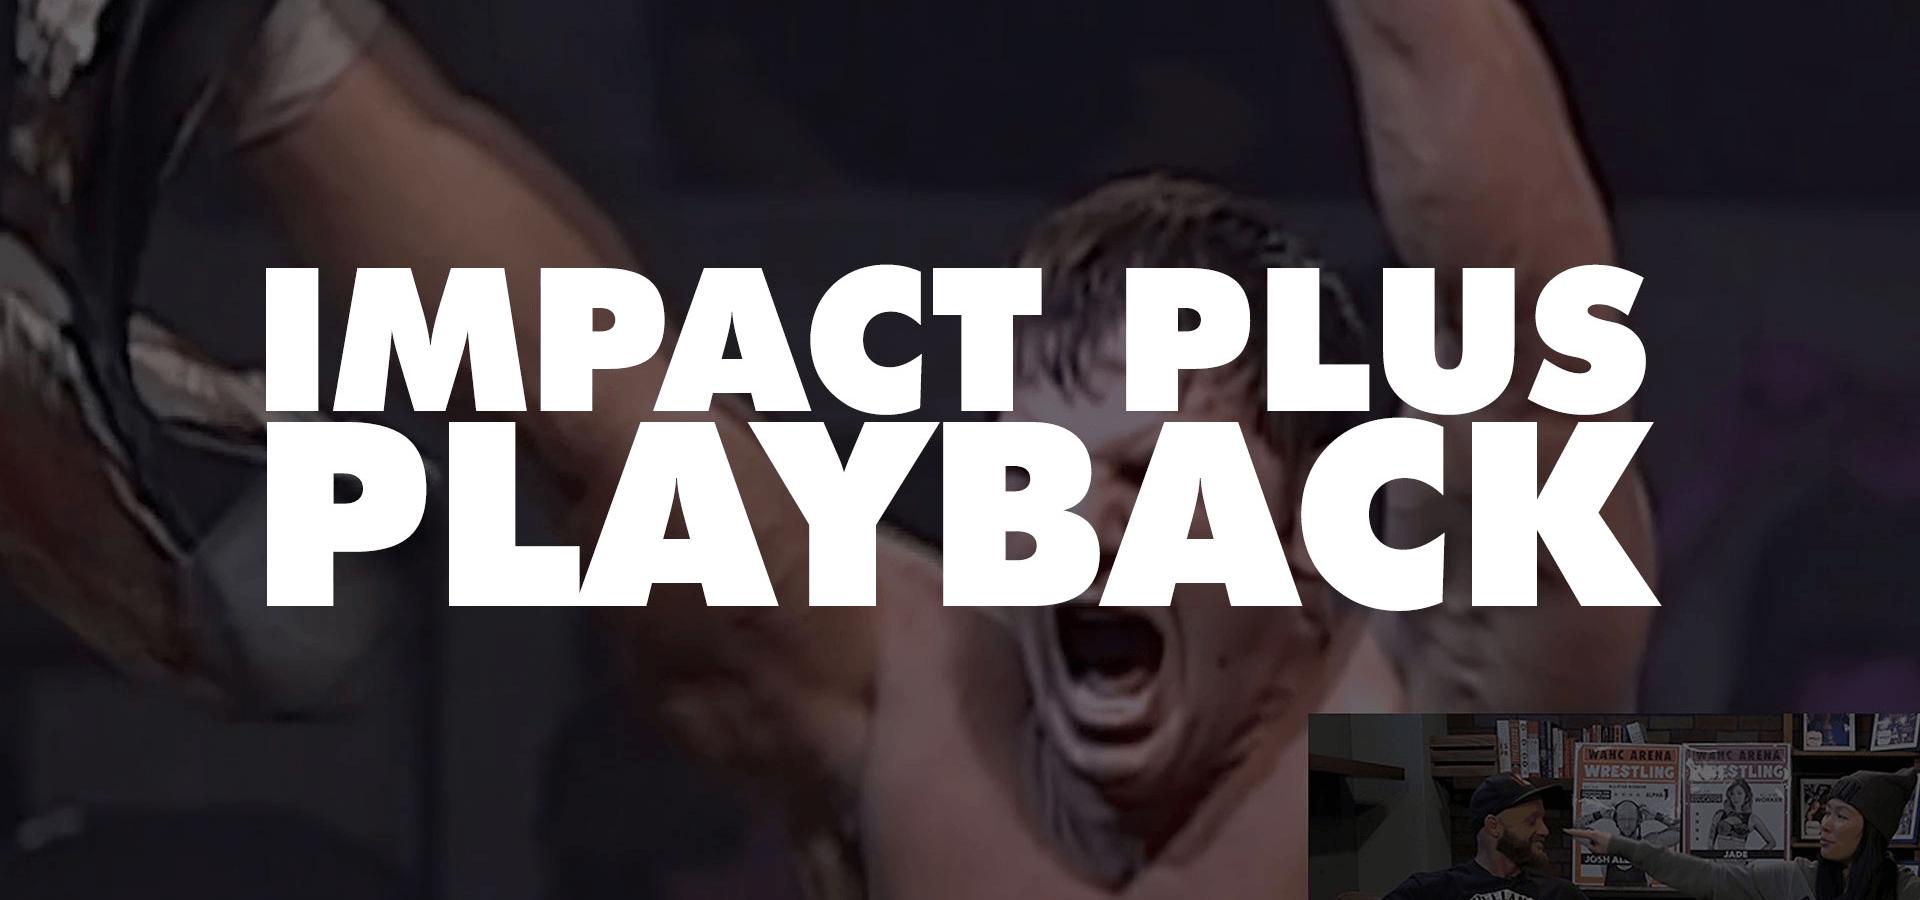 IMPACT Plus Playback